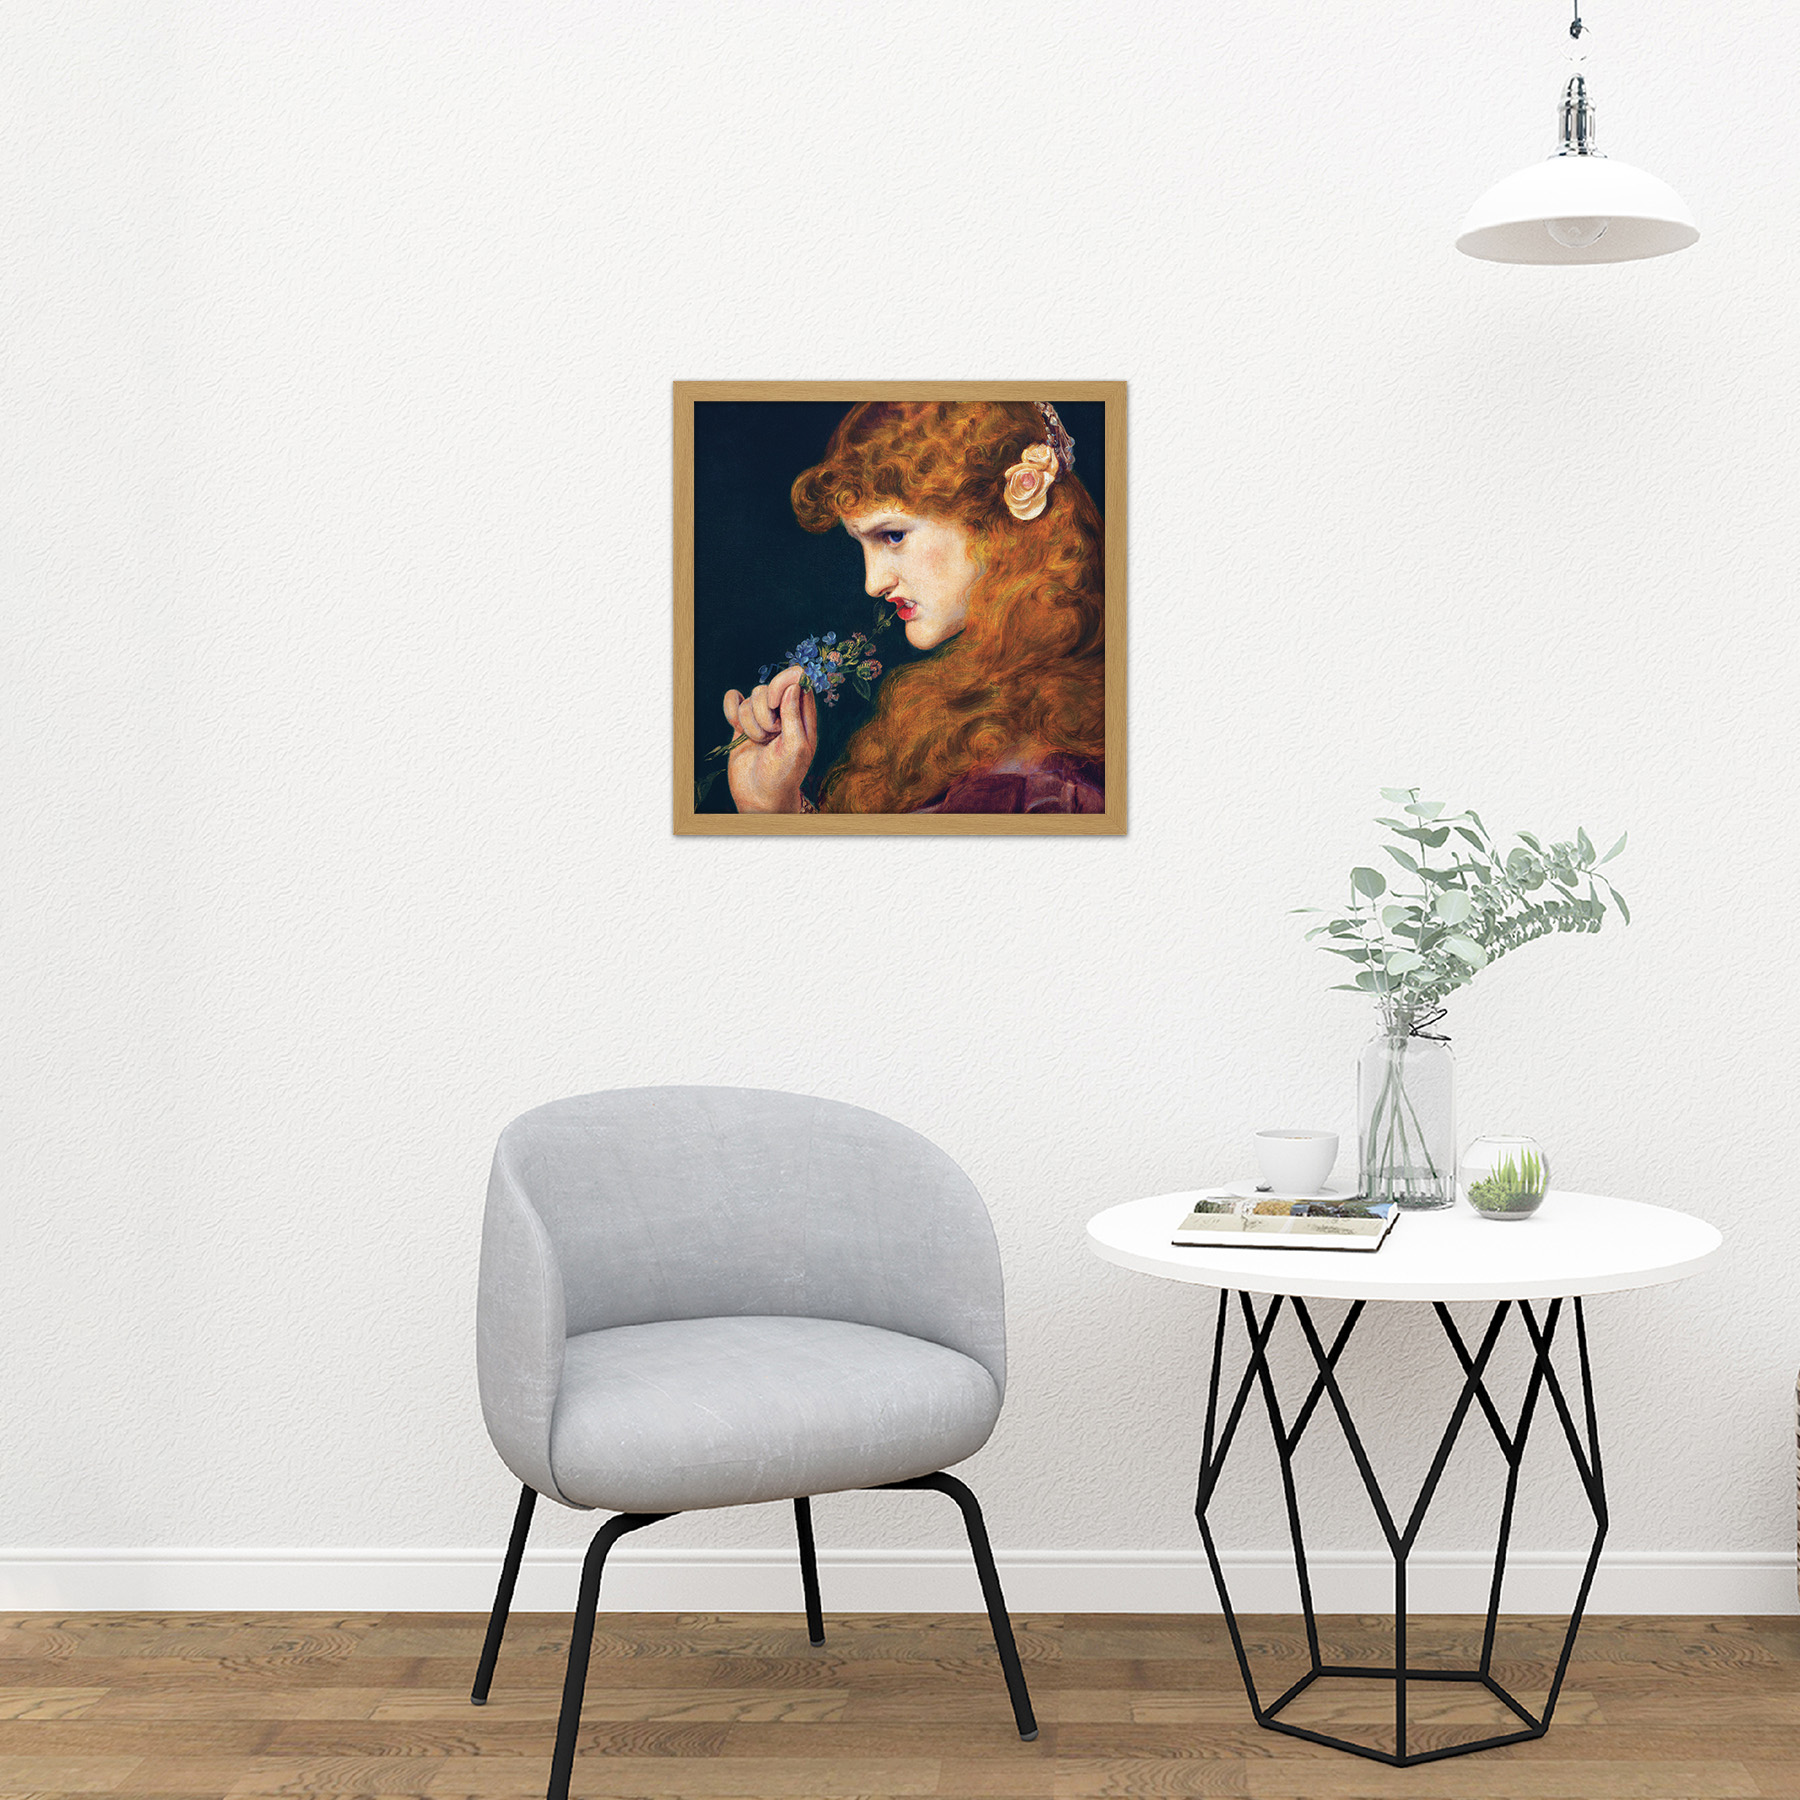 Sandys Loves Shadow Girl Bite Flower Painting XL Wall Art Canvas Print